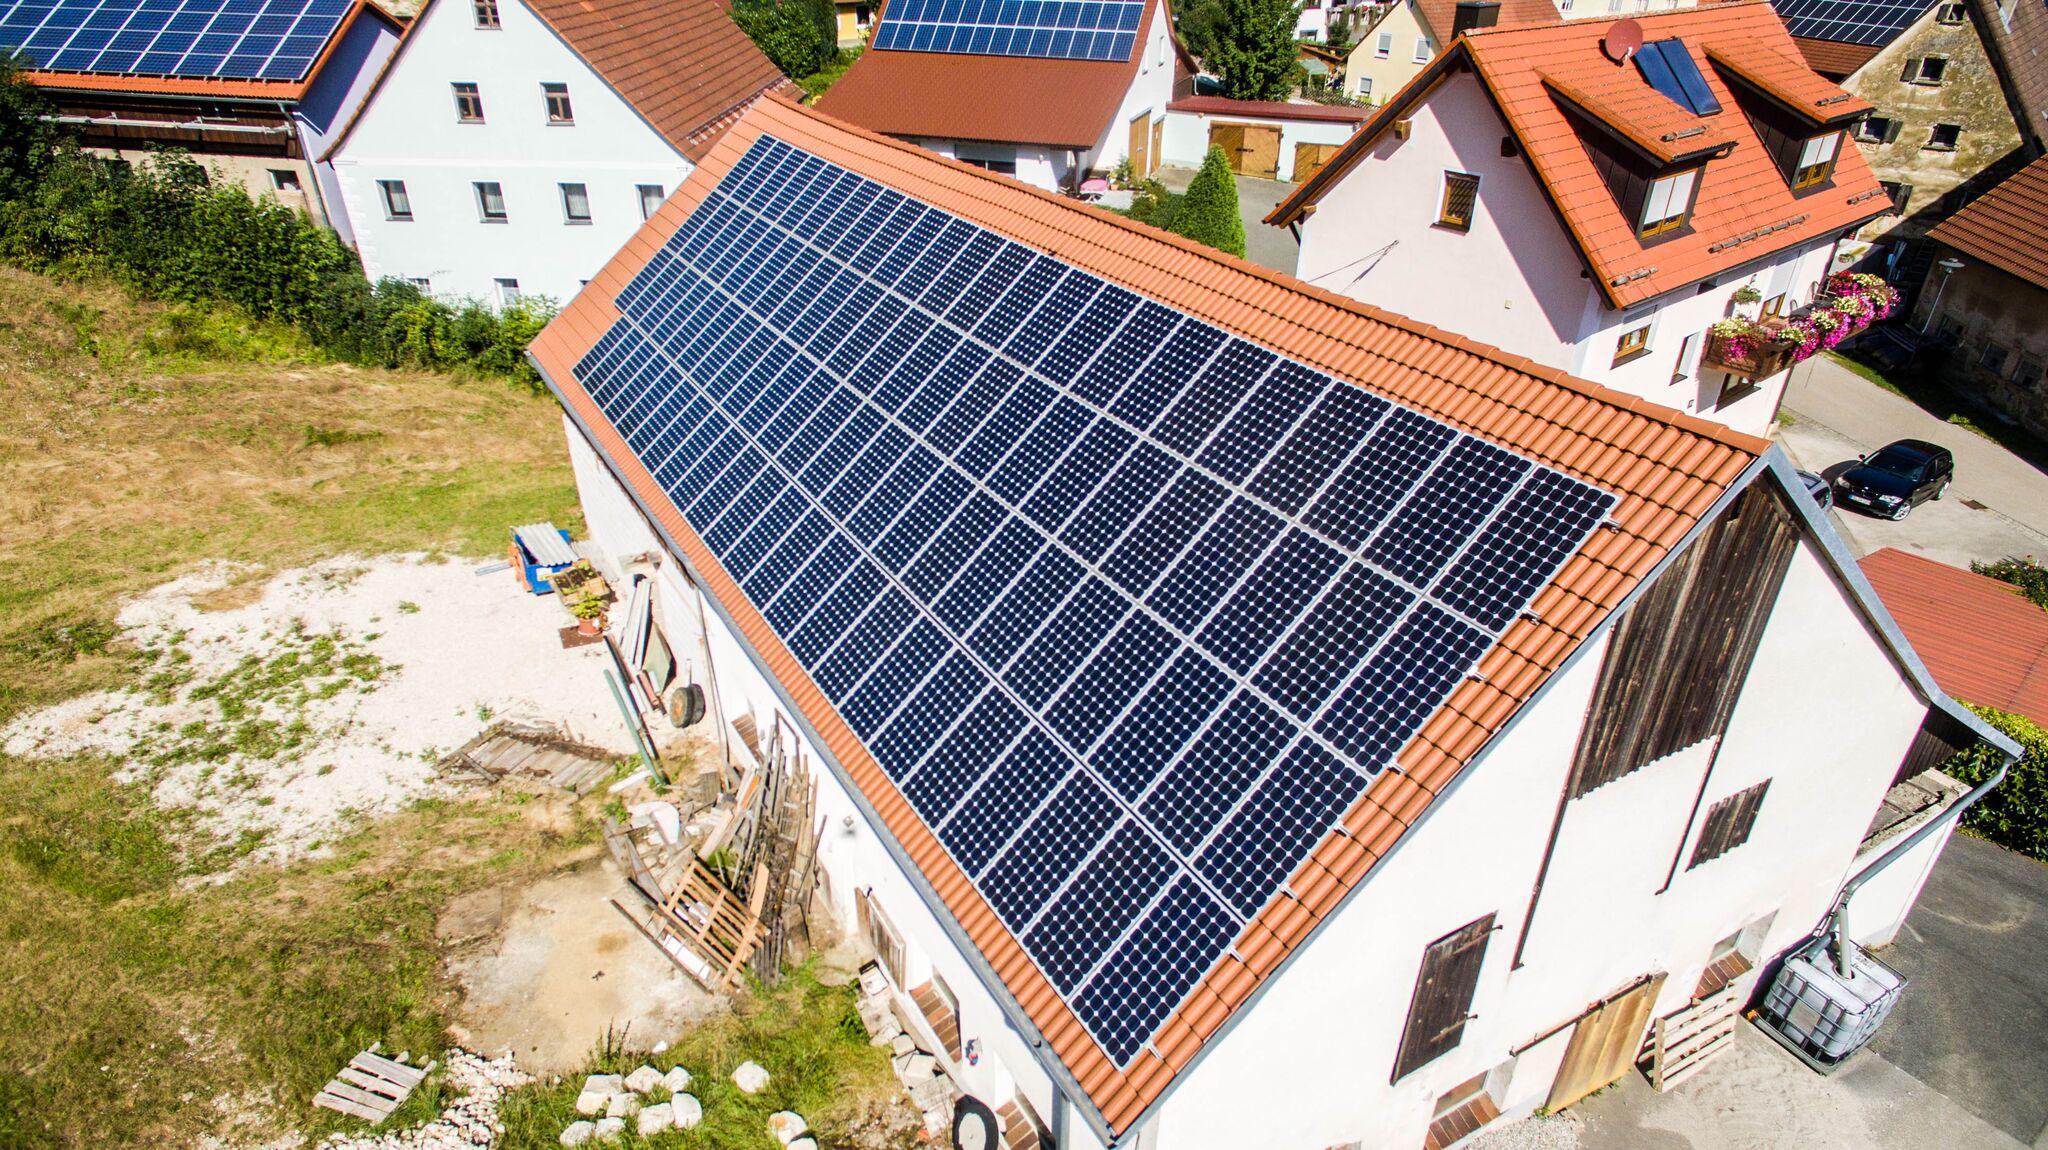 solar bayreuth solaranlagen photovoltaik speicher. Black Bedroom Furniture Sets. Home Design Ideas